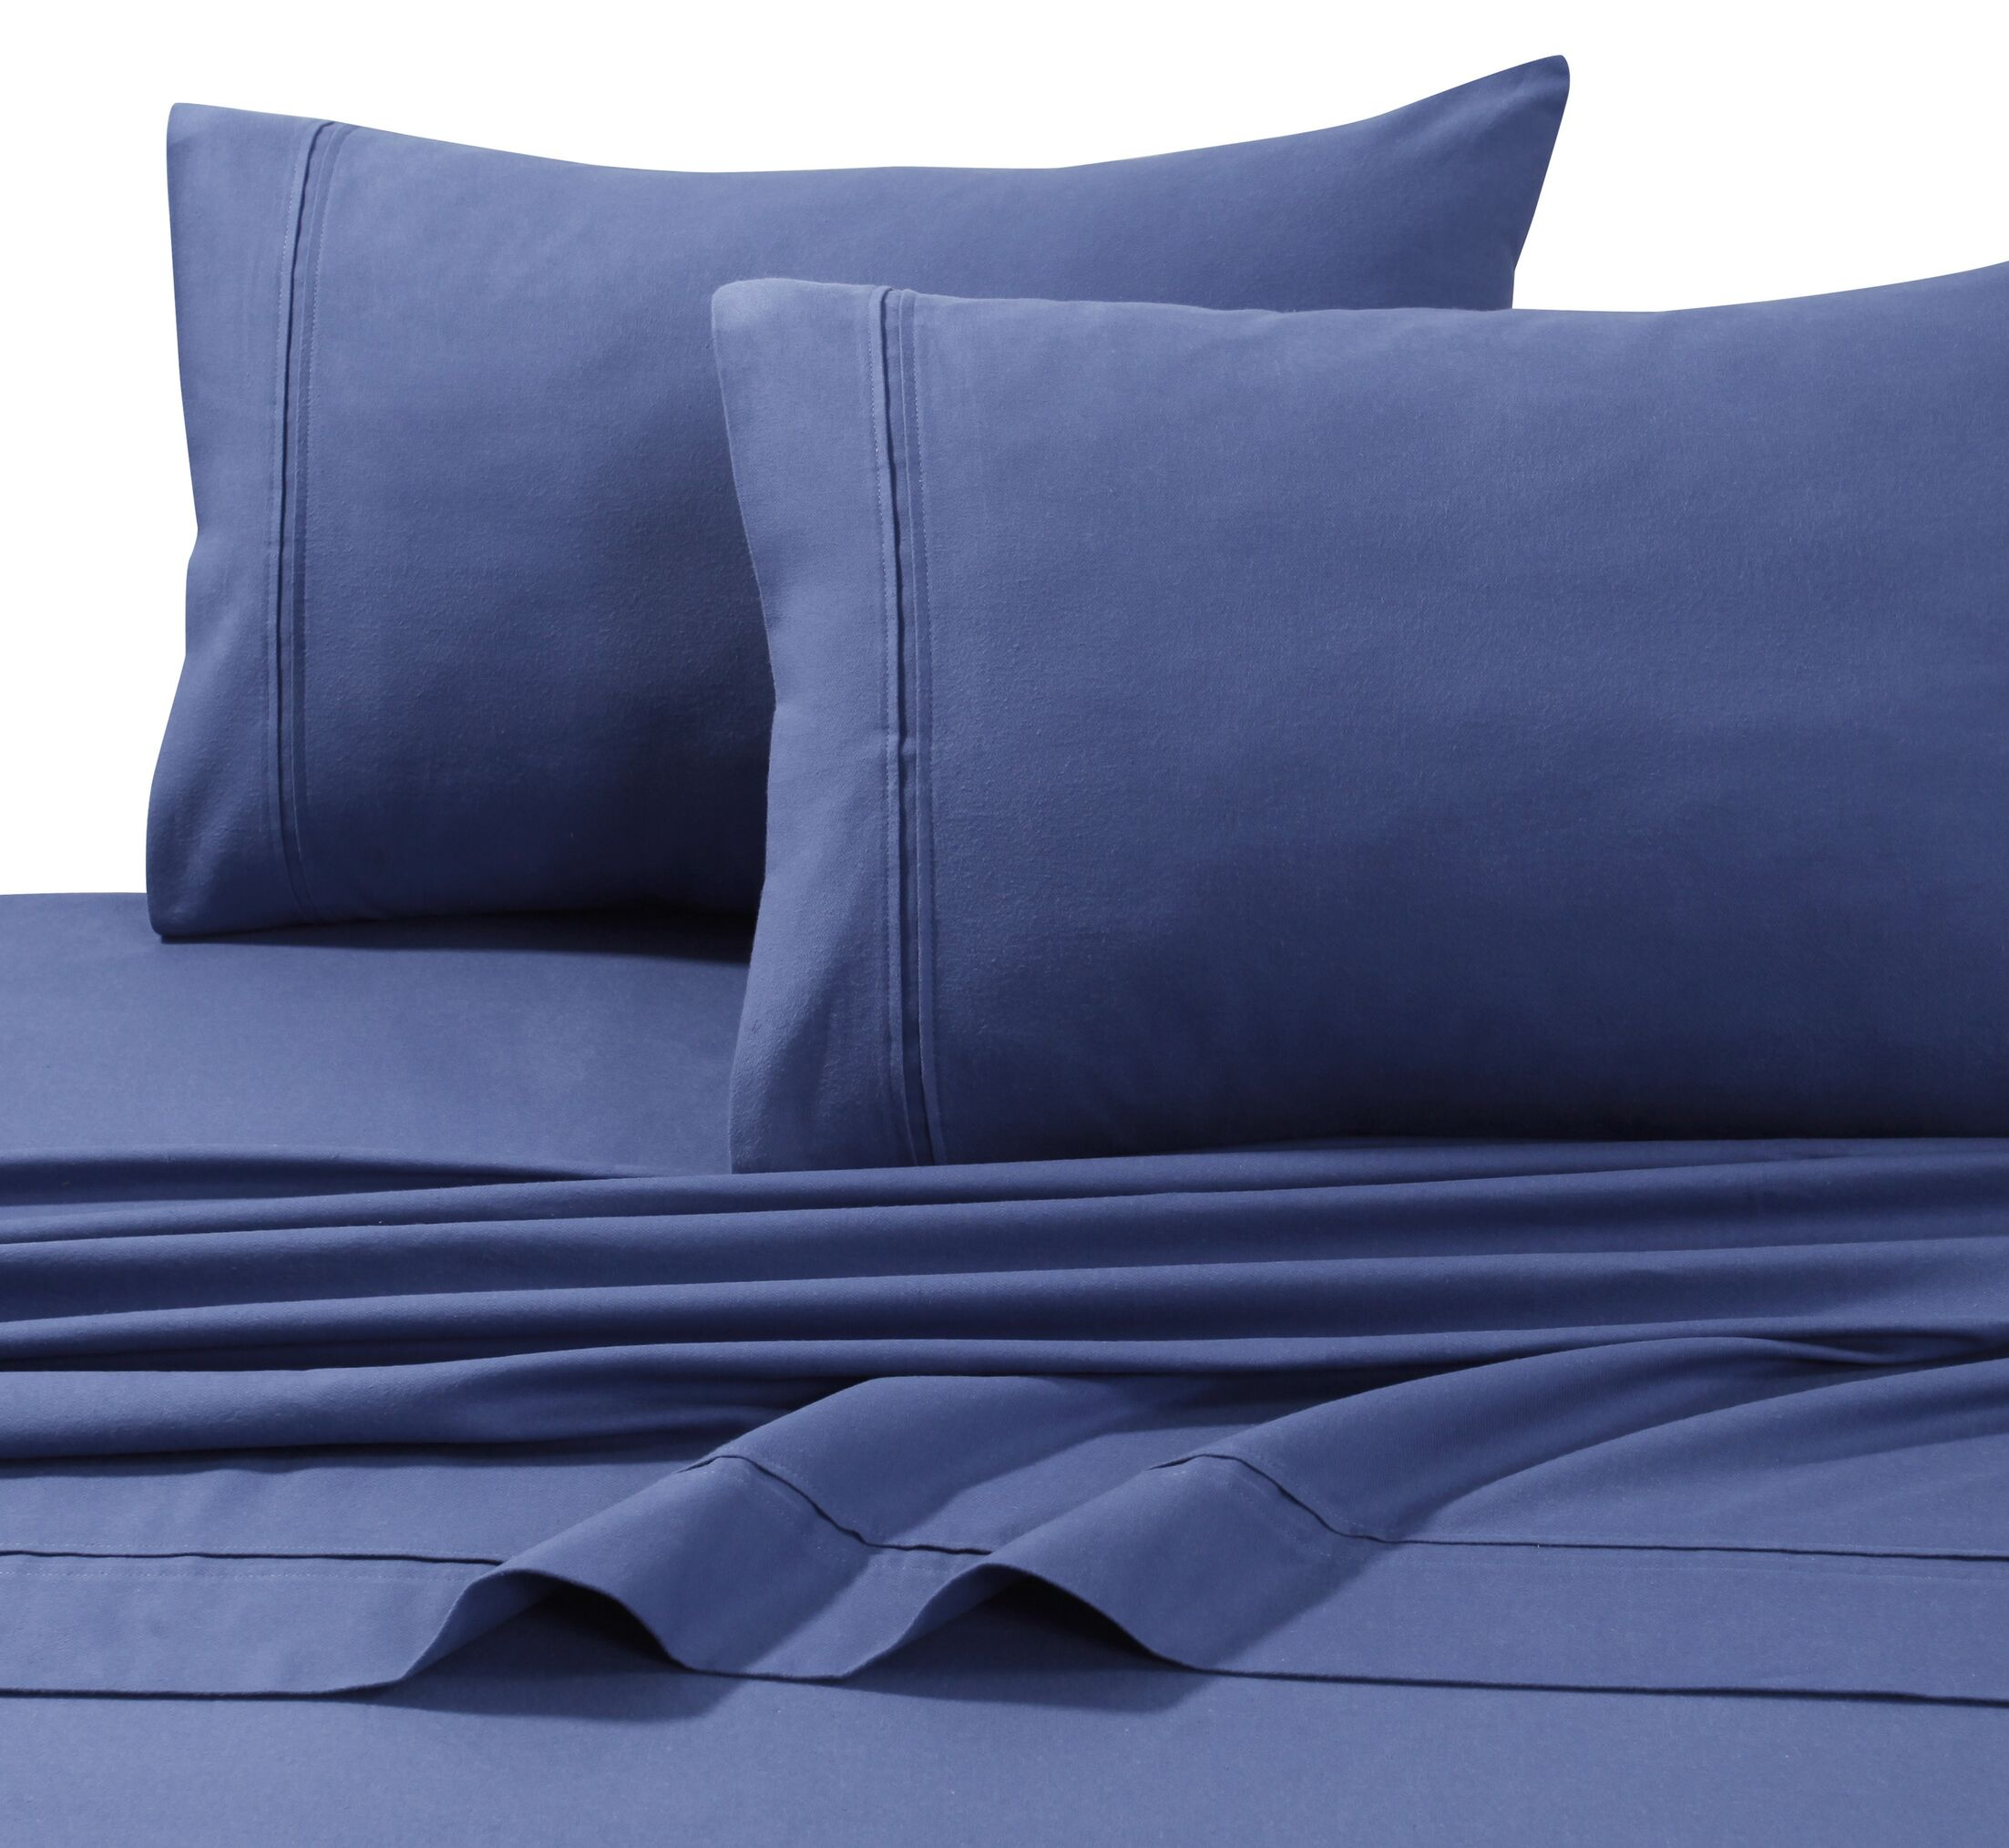 4 Piece Flannel Sheet Set Size: Full, Color: Moonlight Blue